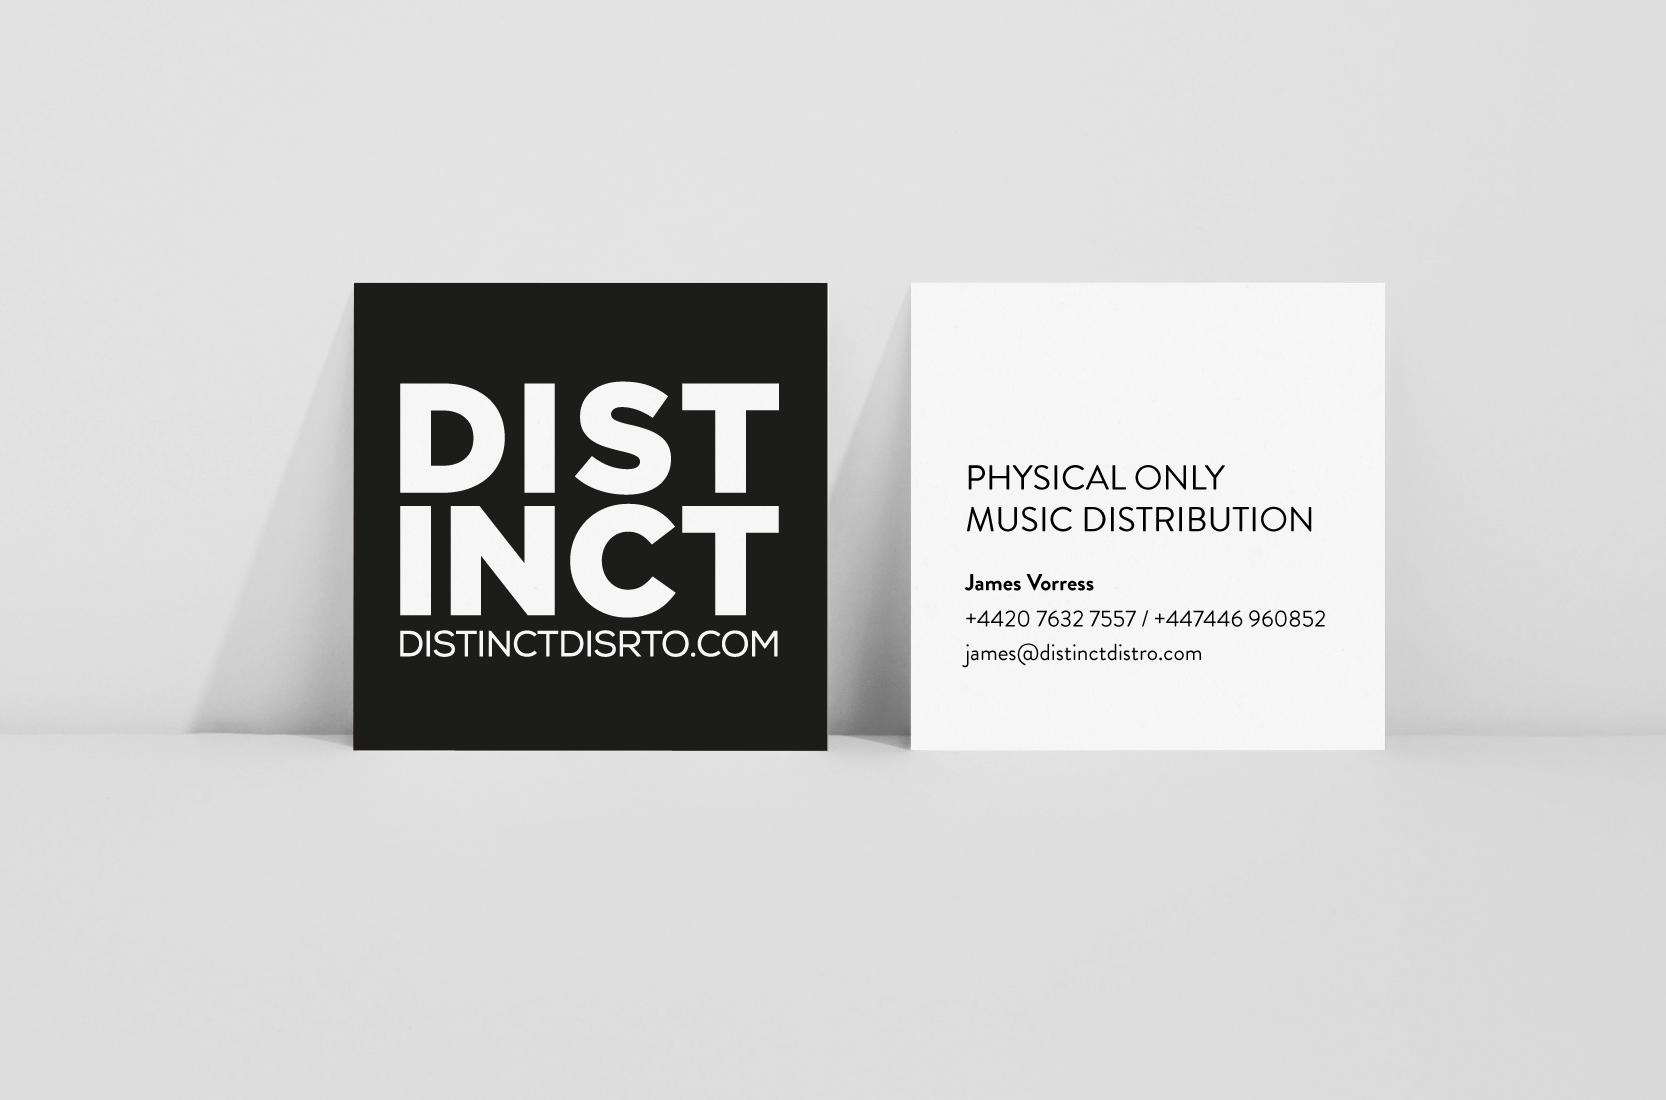 distinctcardsmock3